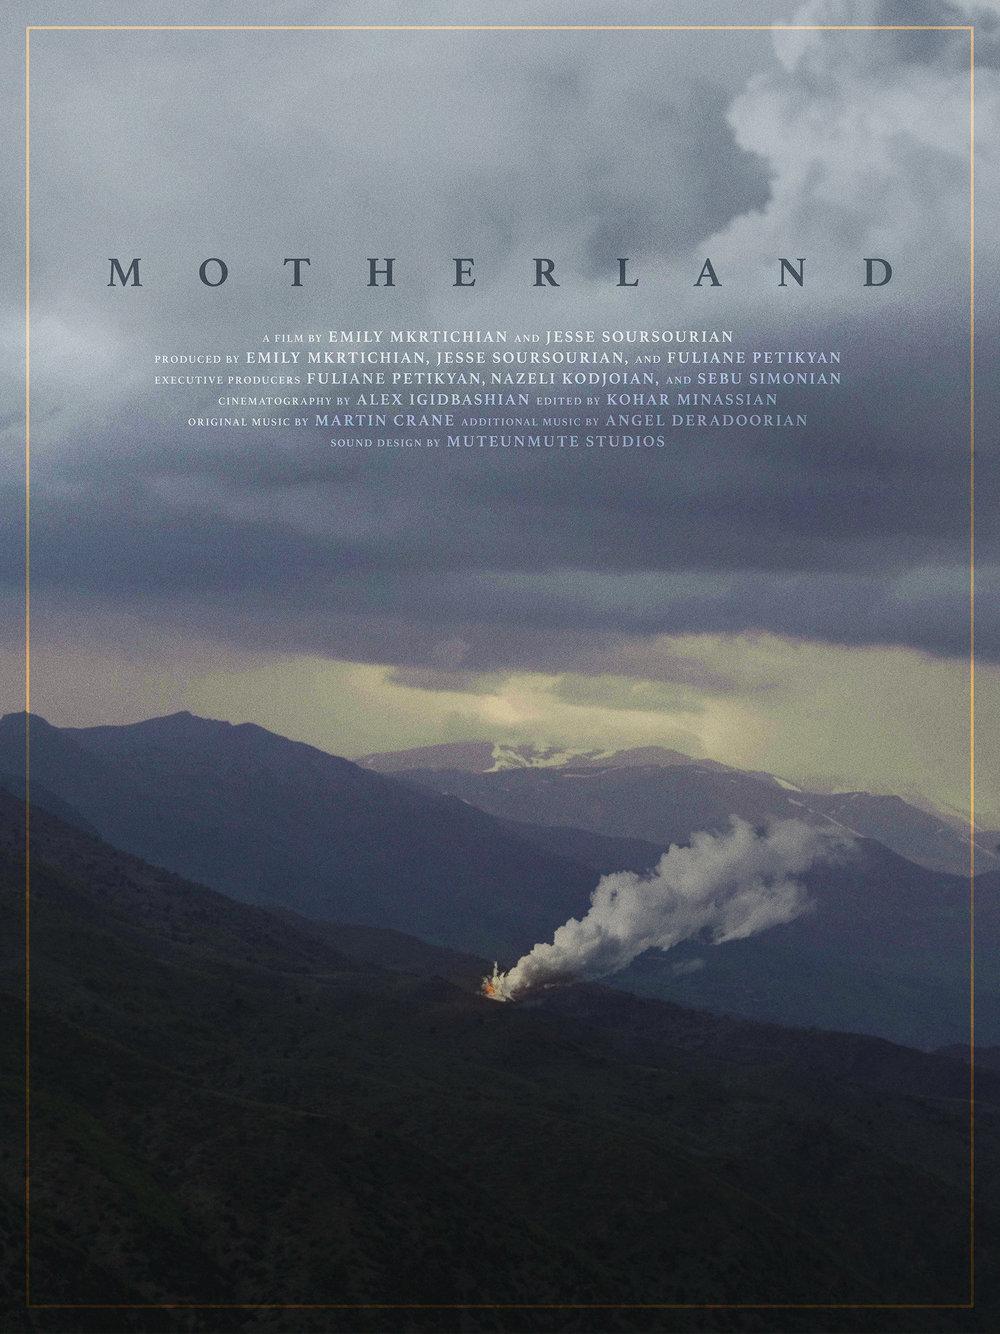 motherland_poster_thumb.jpg